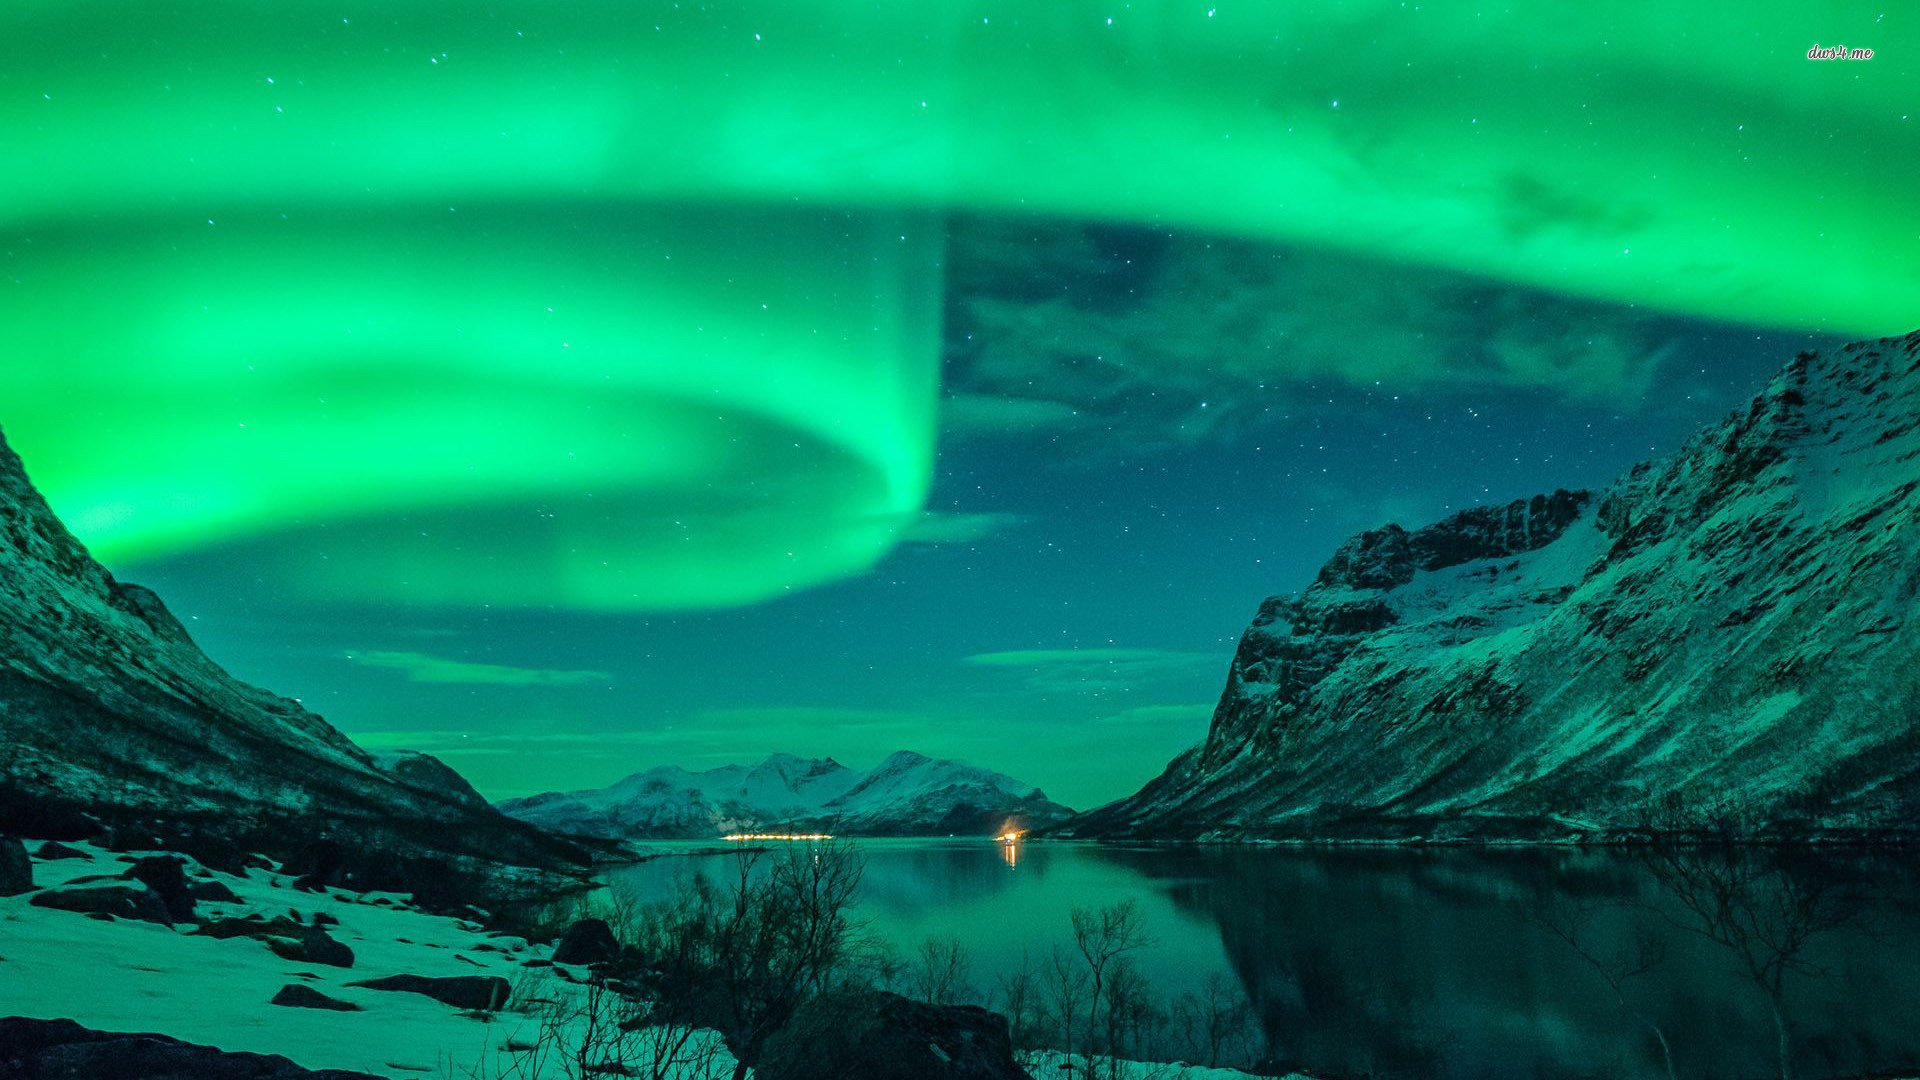 ... taking-aurora-borealis-1920x1080-nature-wallpaper wallpaper background